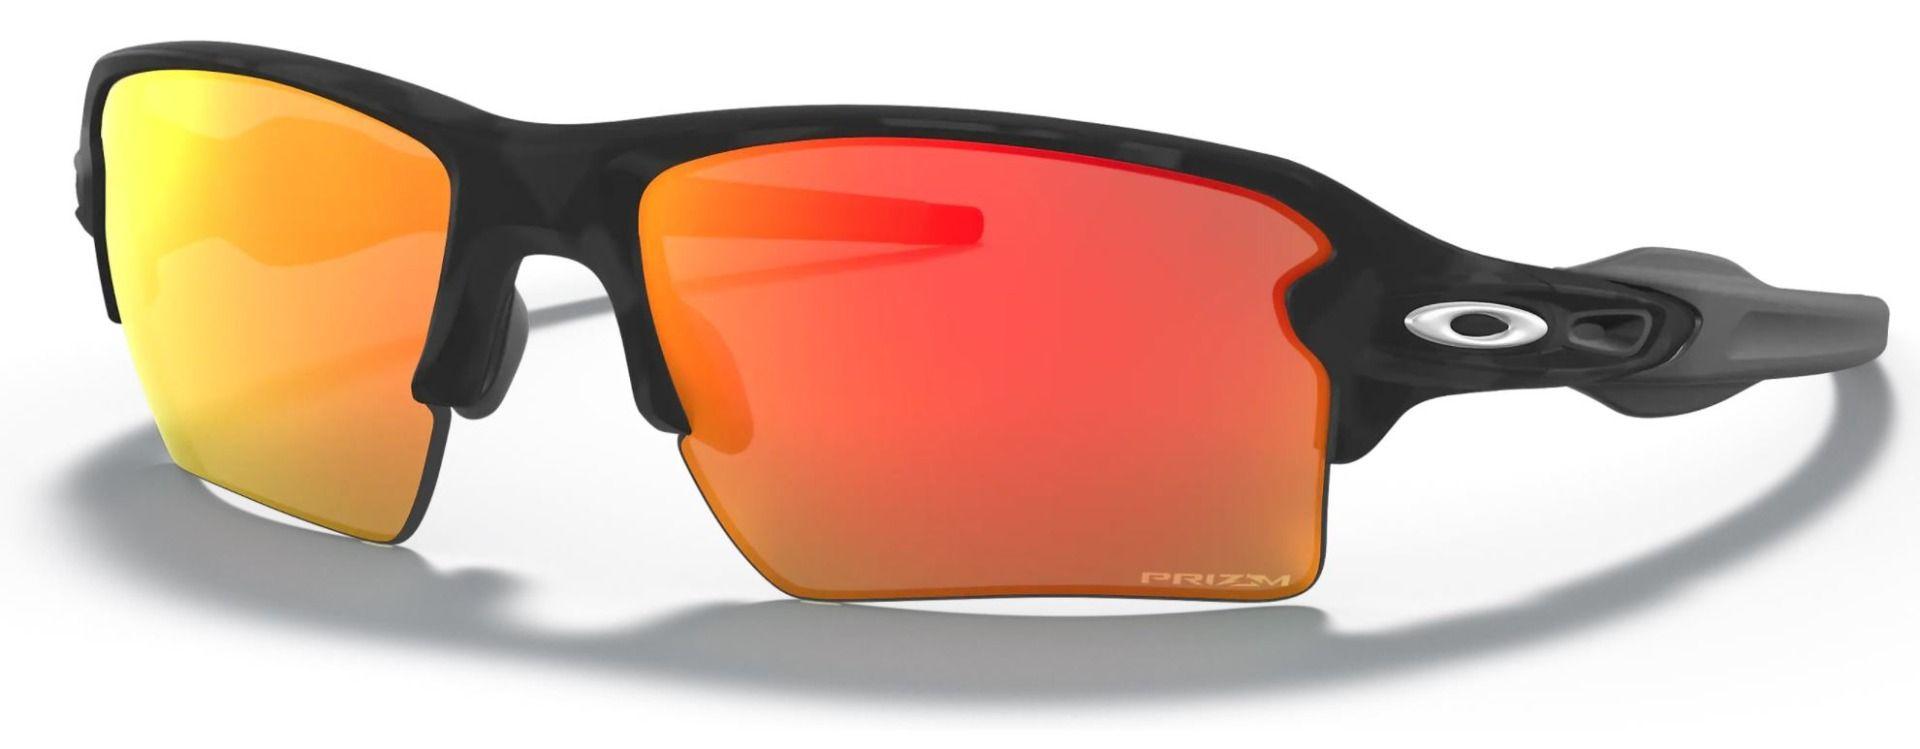 Oakley Flak 2.0 XL Sunglasses Prizm Ruby